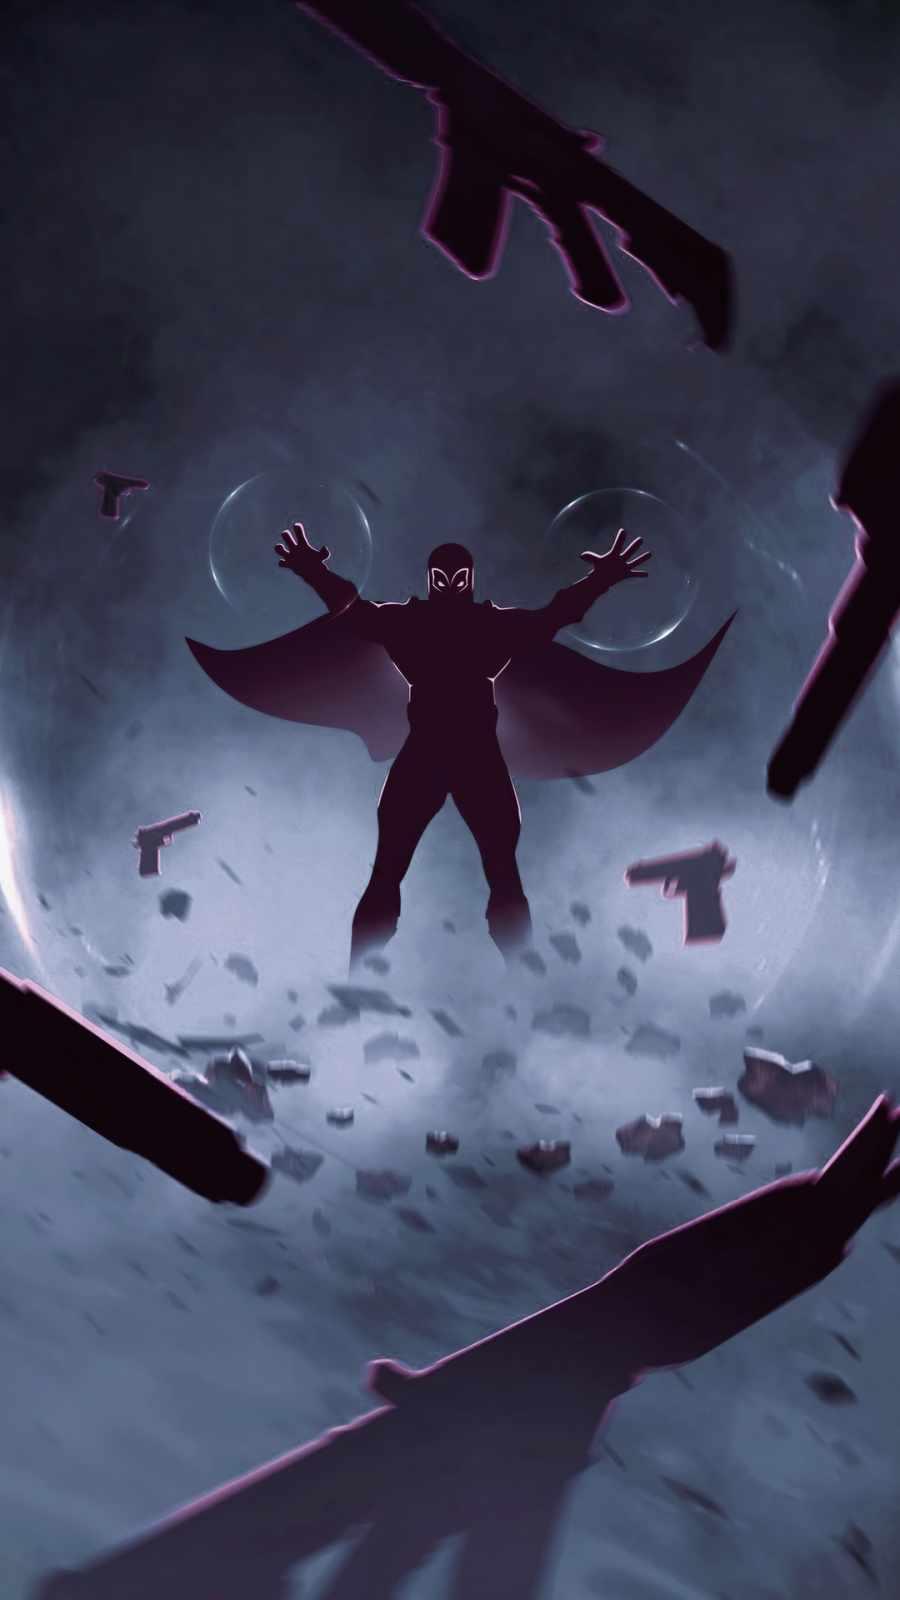 Magneto 2022 iPhone Wallpaper